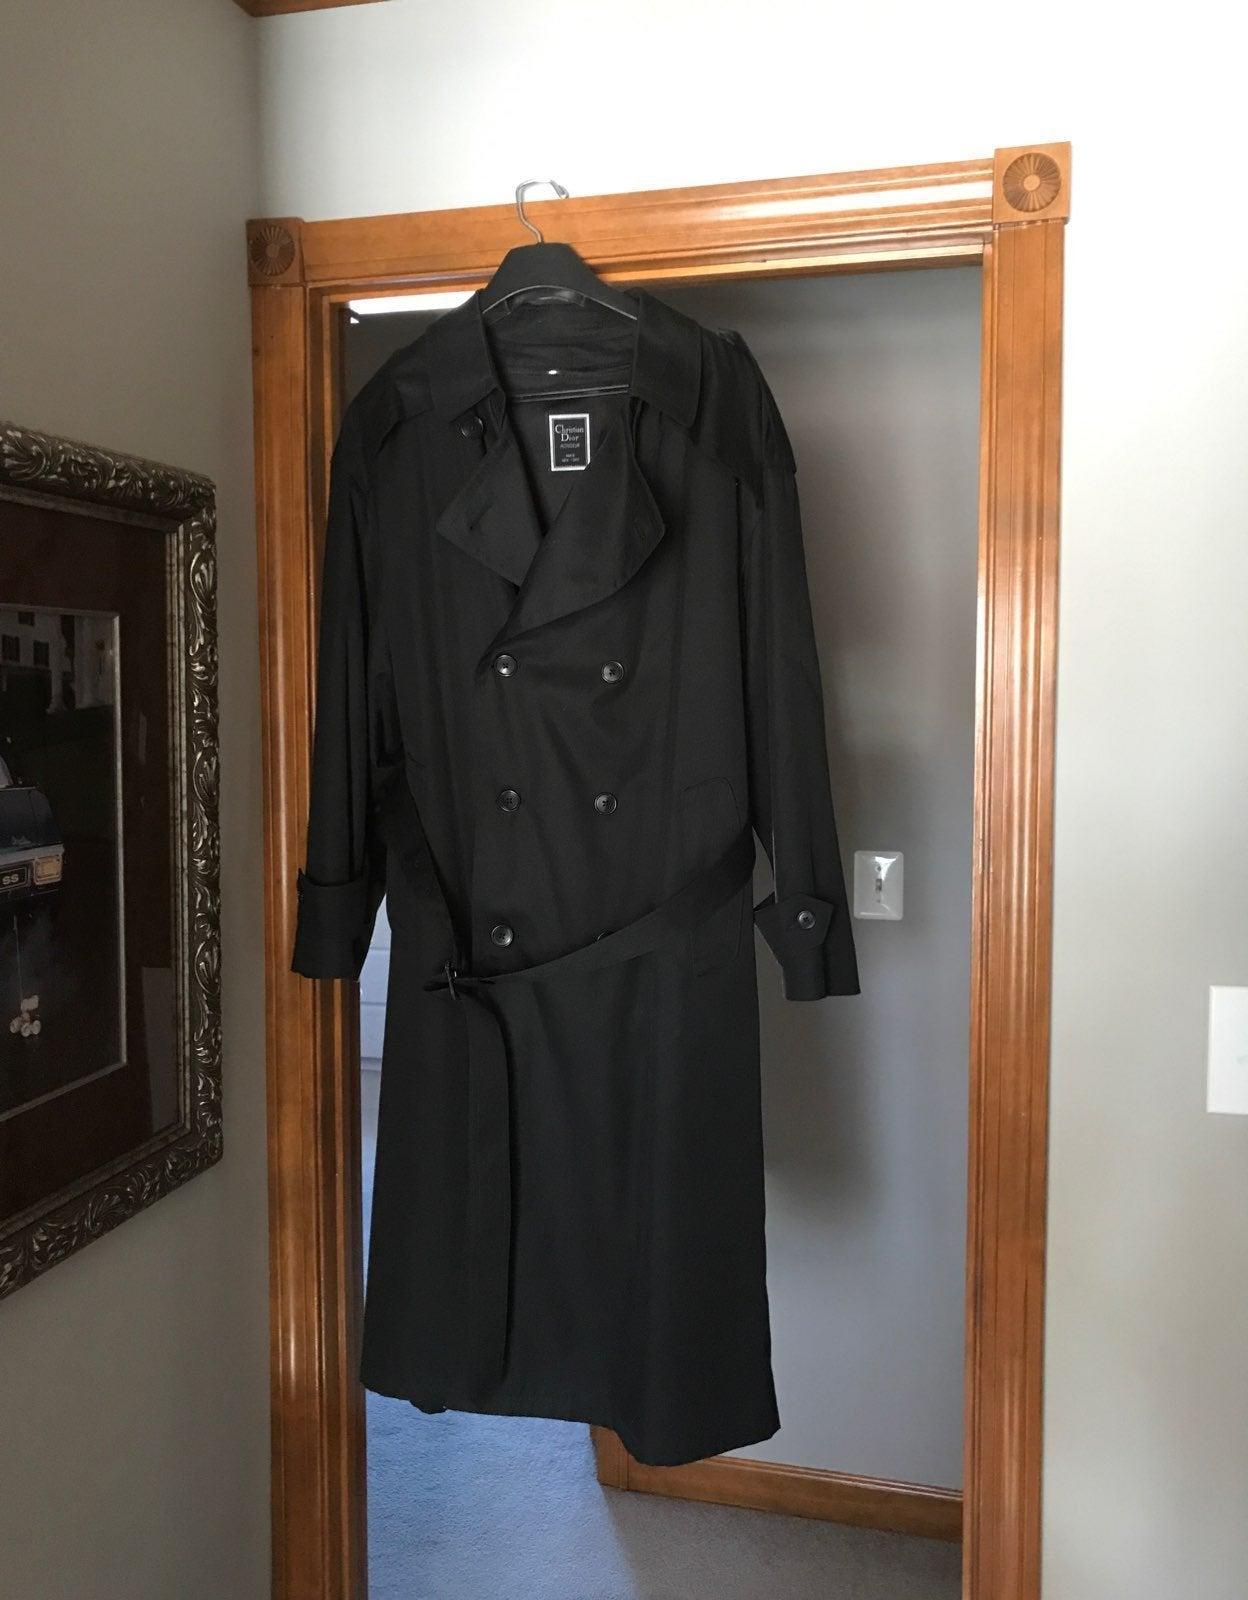 Christian Dior 42 R Men's Trench Coat